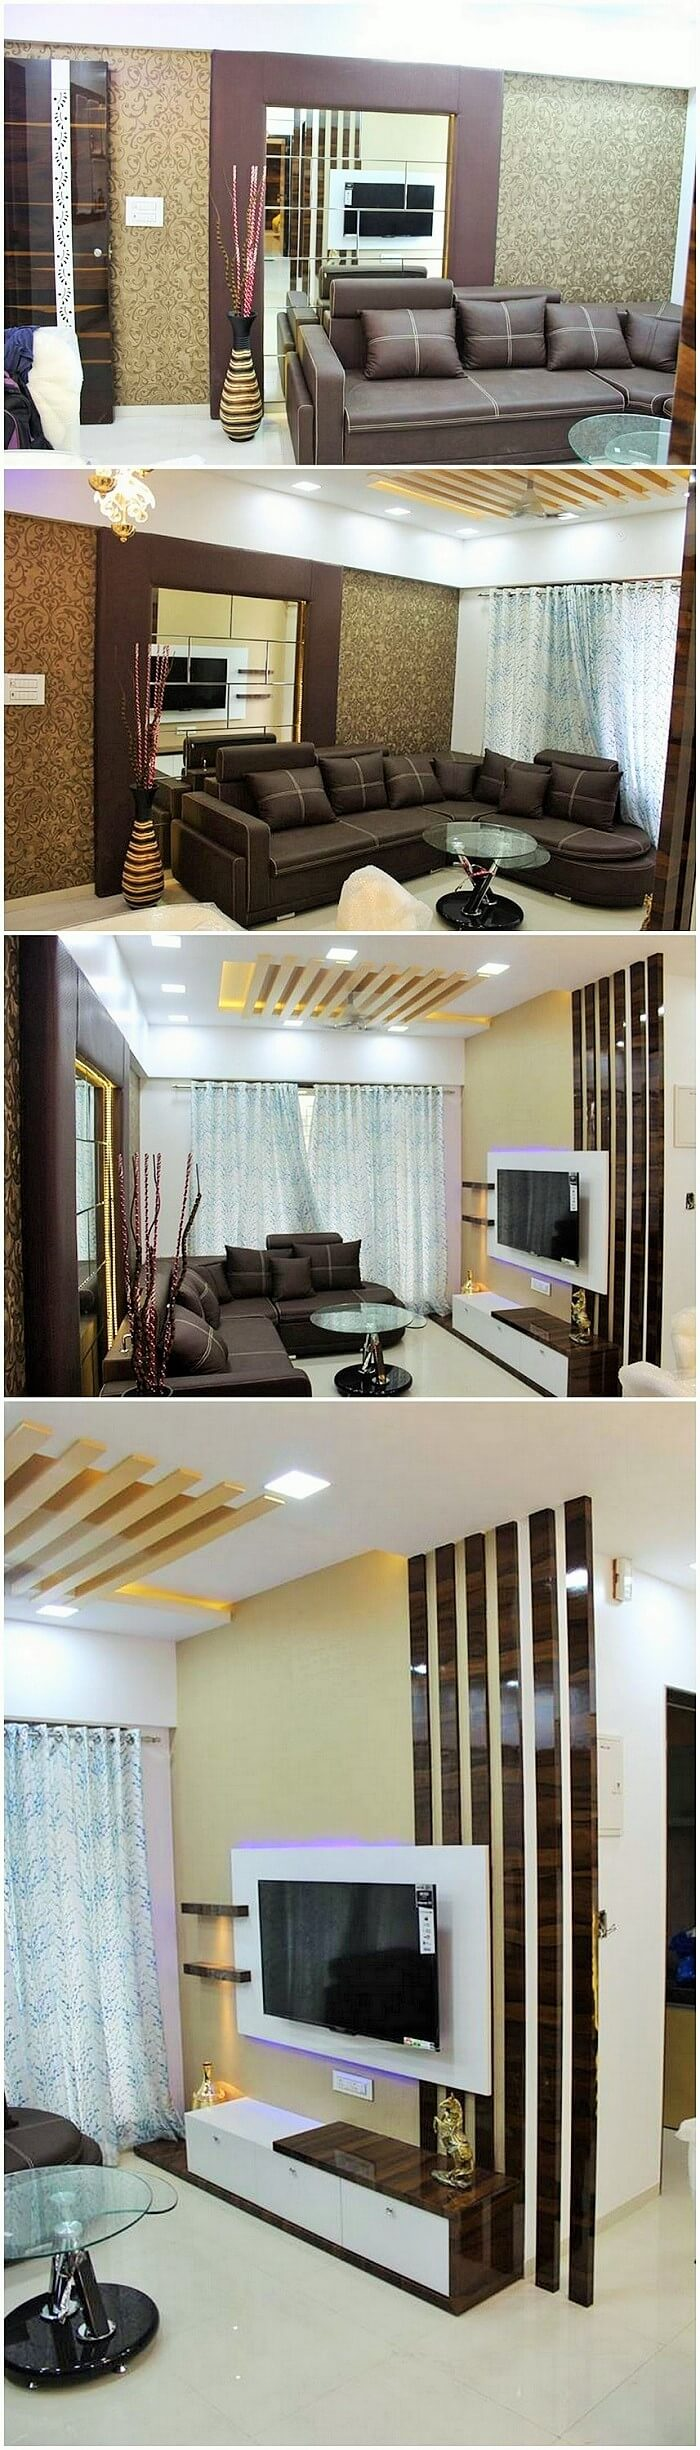 DIY-Farmhouse-Living-Room-Decorating-Ideas-2